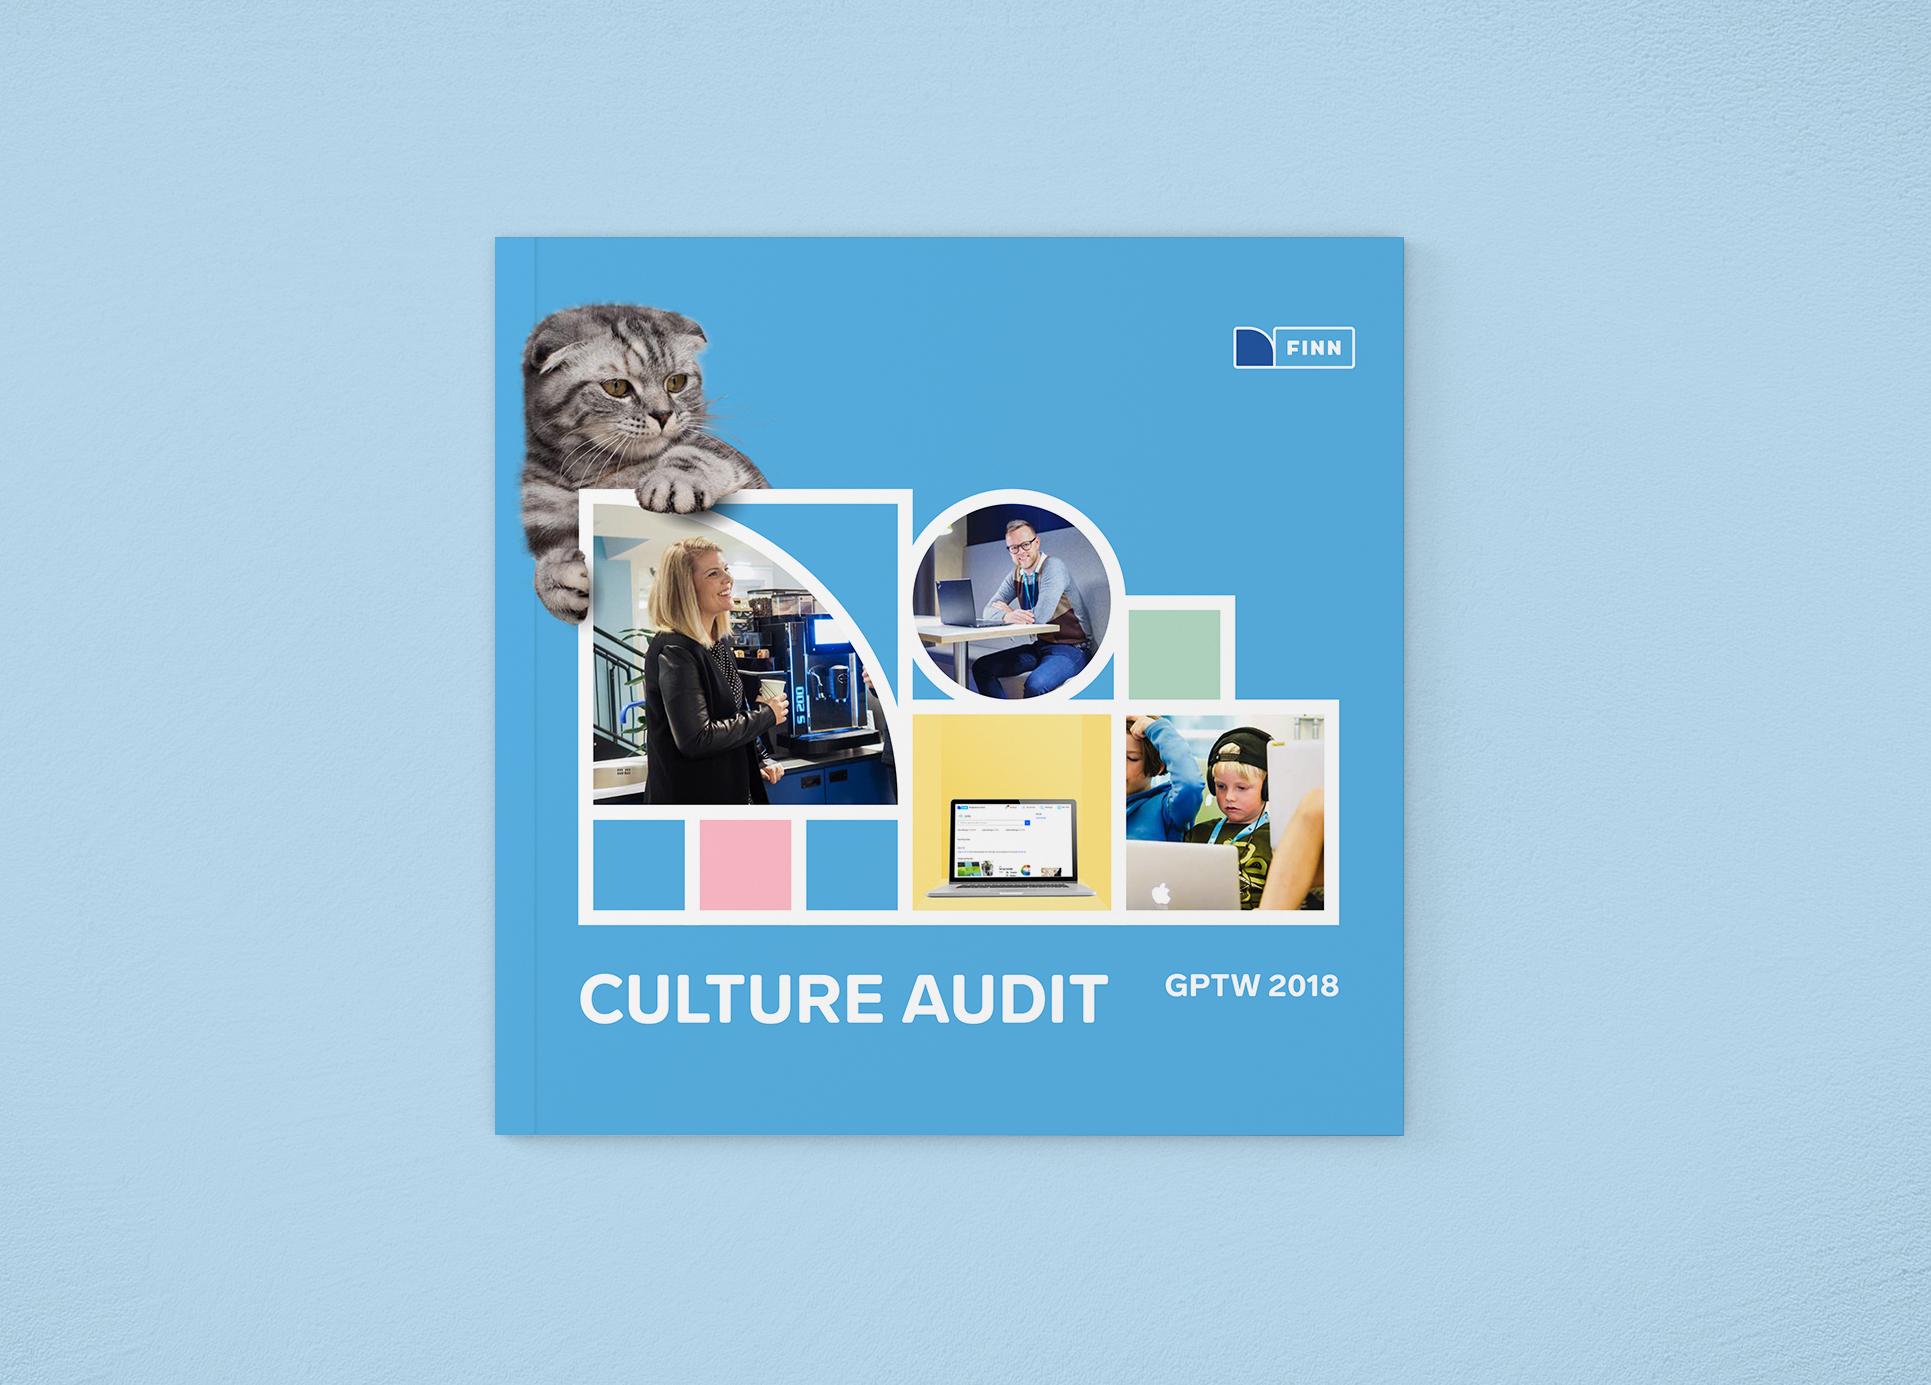 FINN_CultureAudit2018